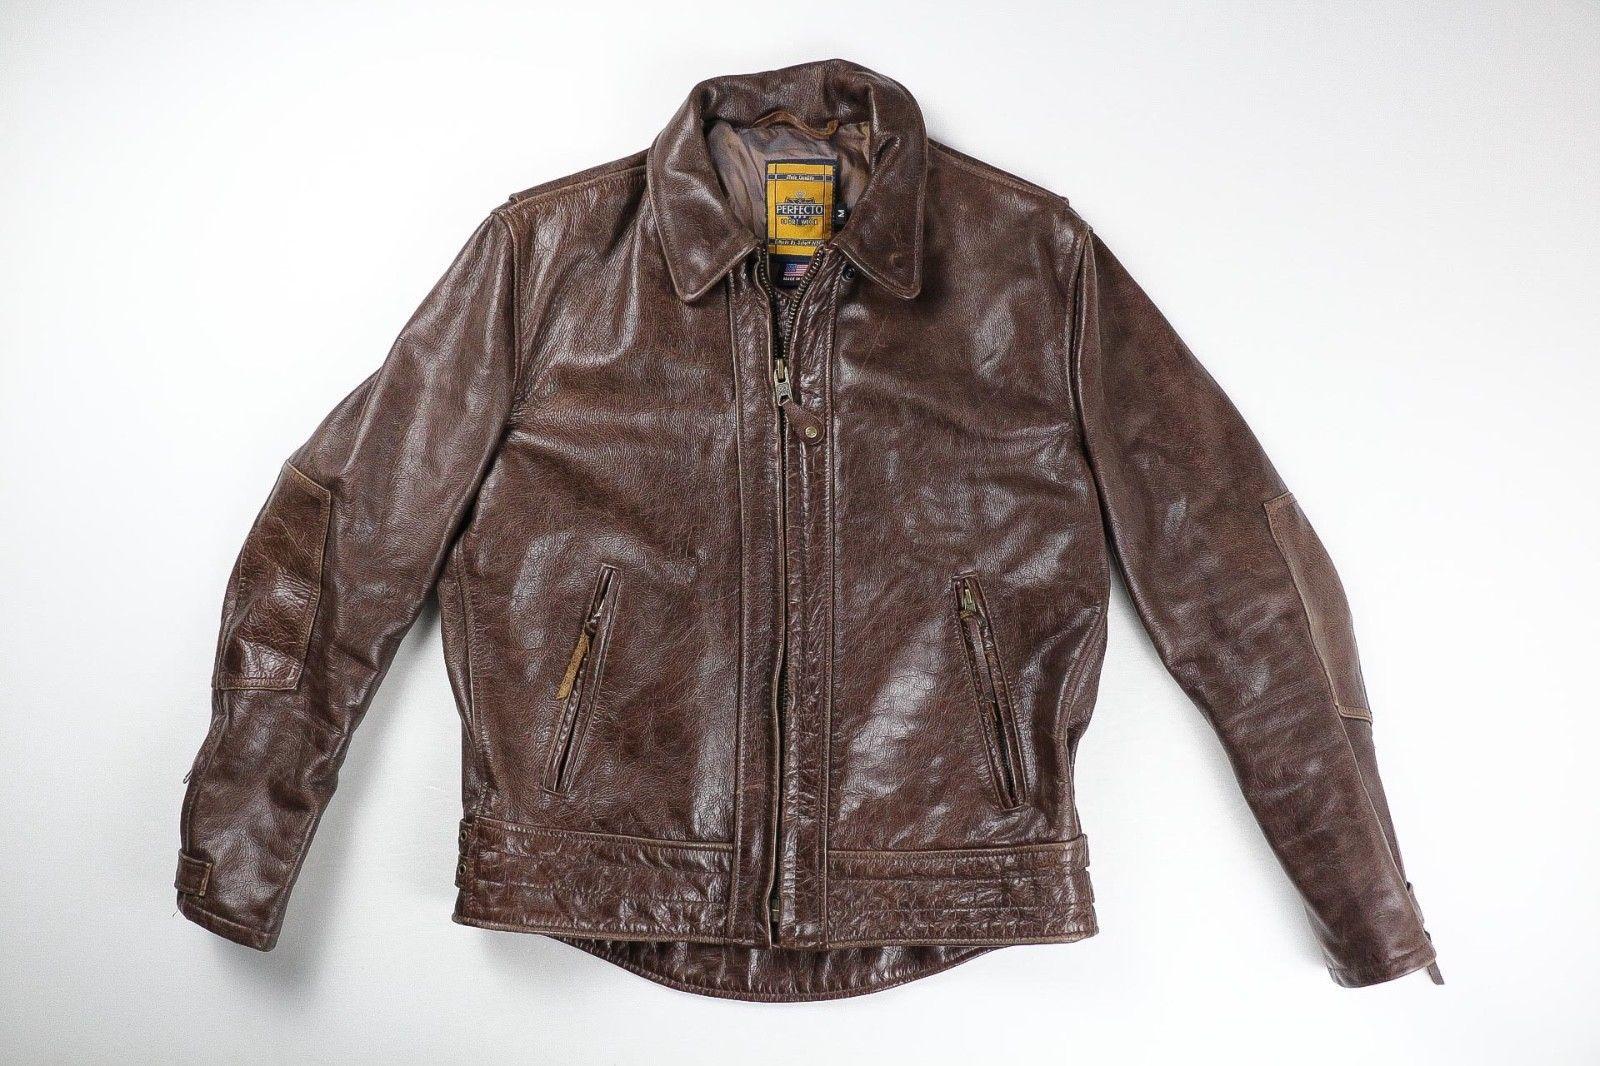 Schott Perfecto 585 Vintage Motorcycle Antique Brown Leather Jacket Medium 865 Leather Jacket Jackets Brown Leather Jacket [ 1066 x 1600 Pixel ]